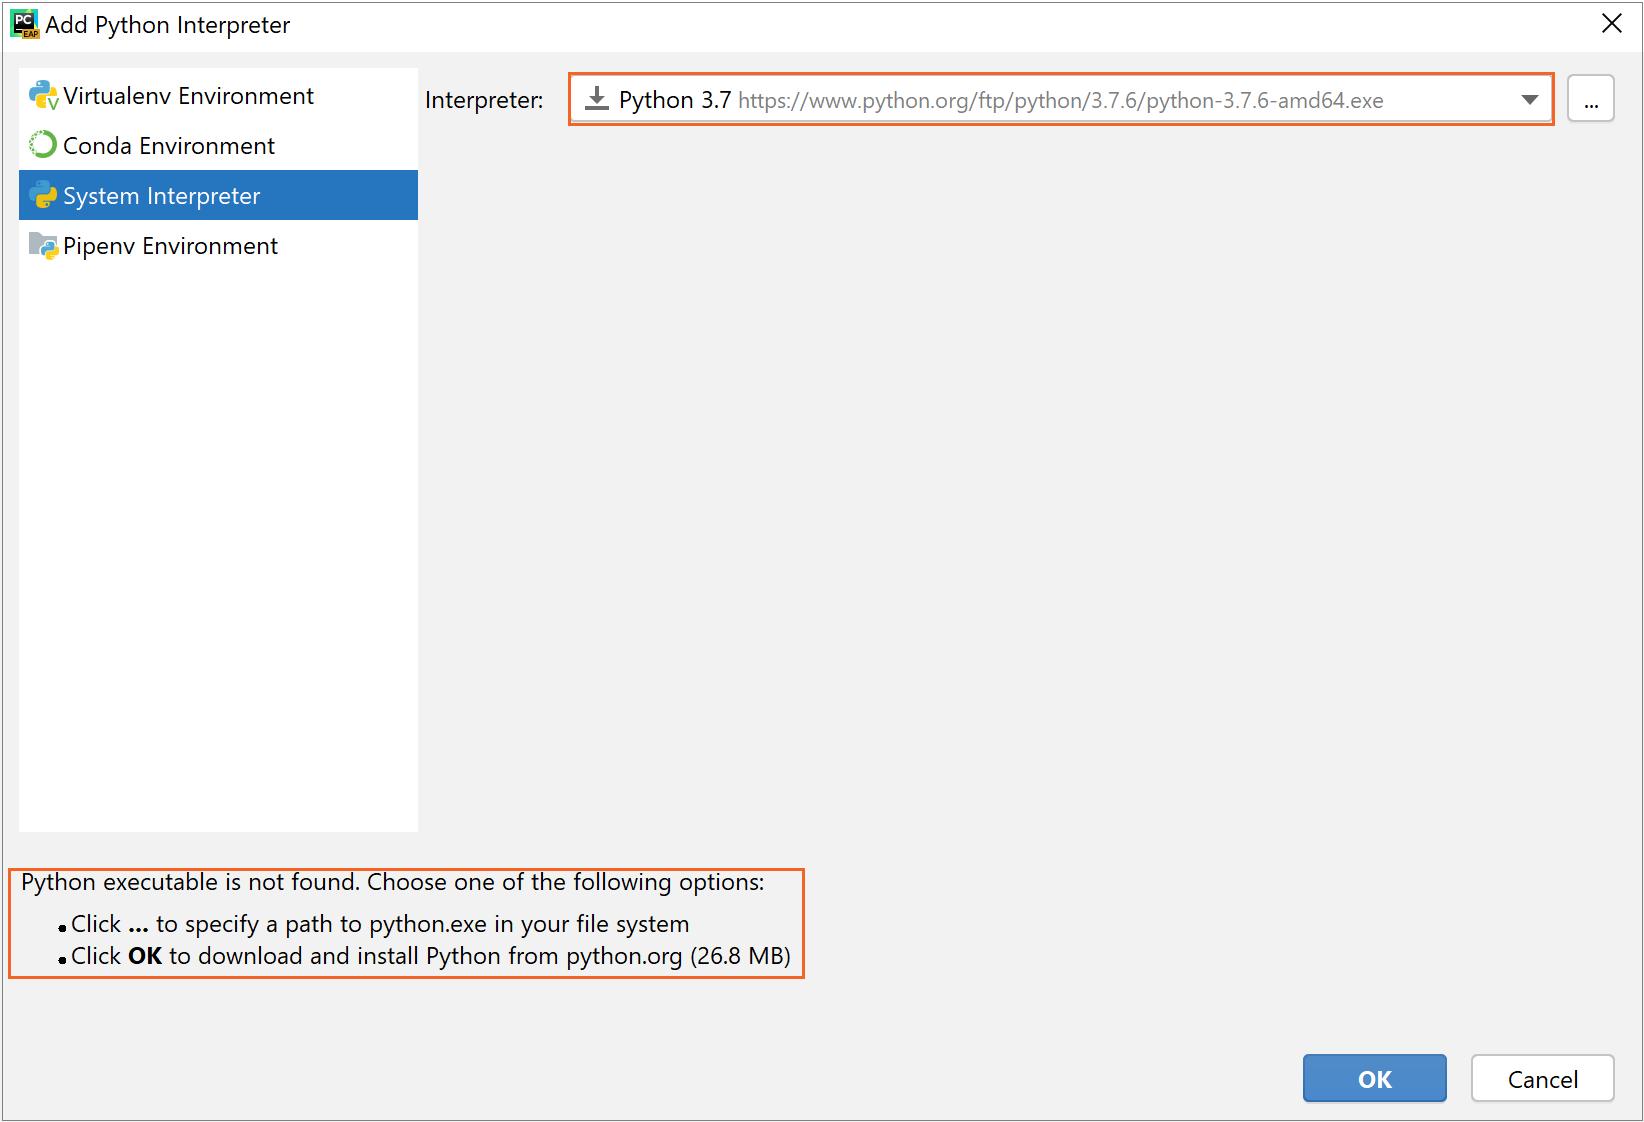 Downloading Python when installing the system interpreter